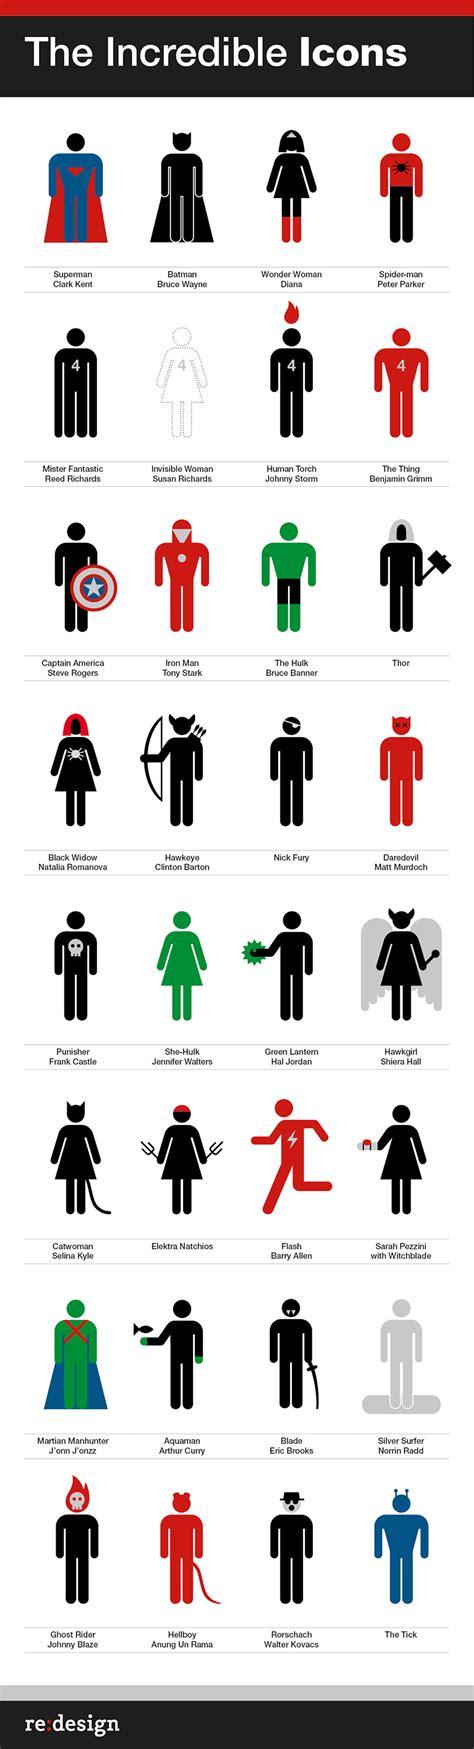 re layout re design superheroes supervillains icons